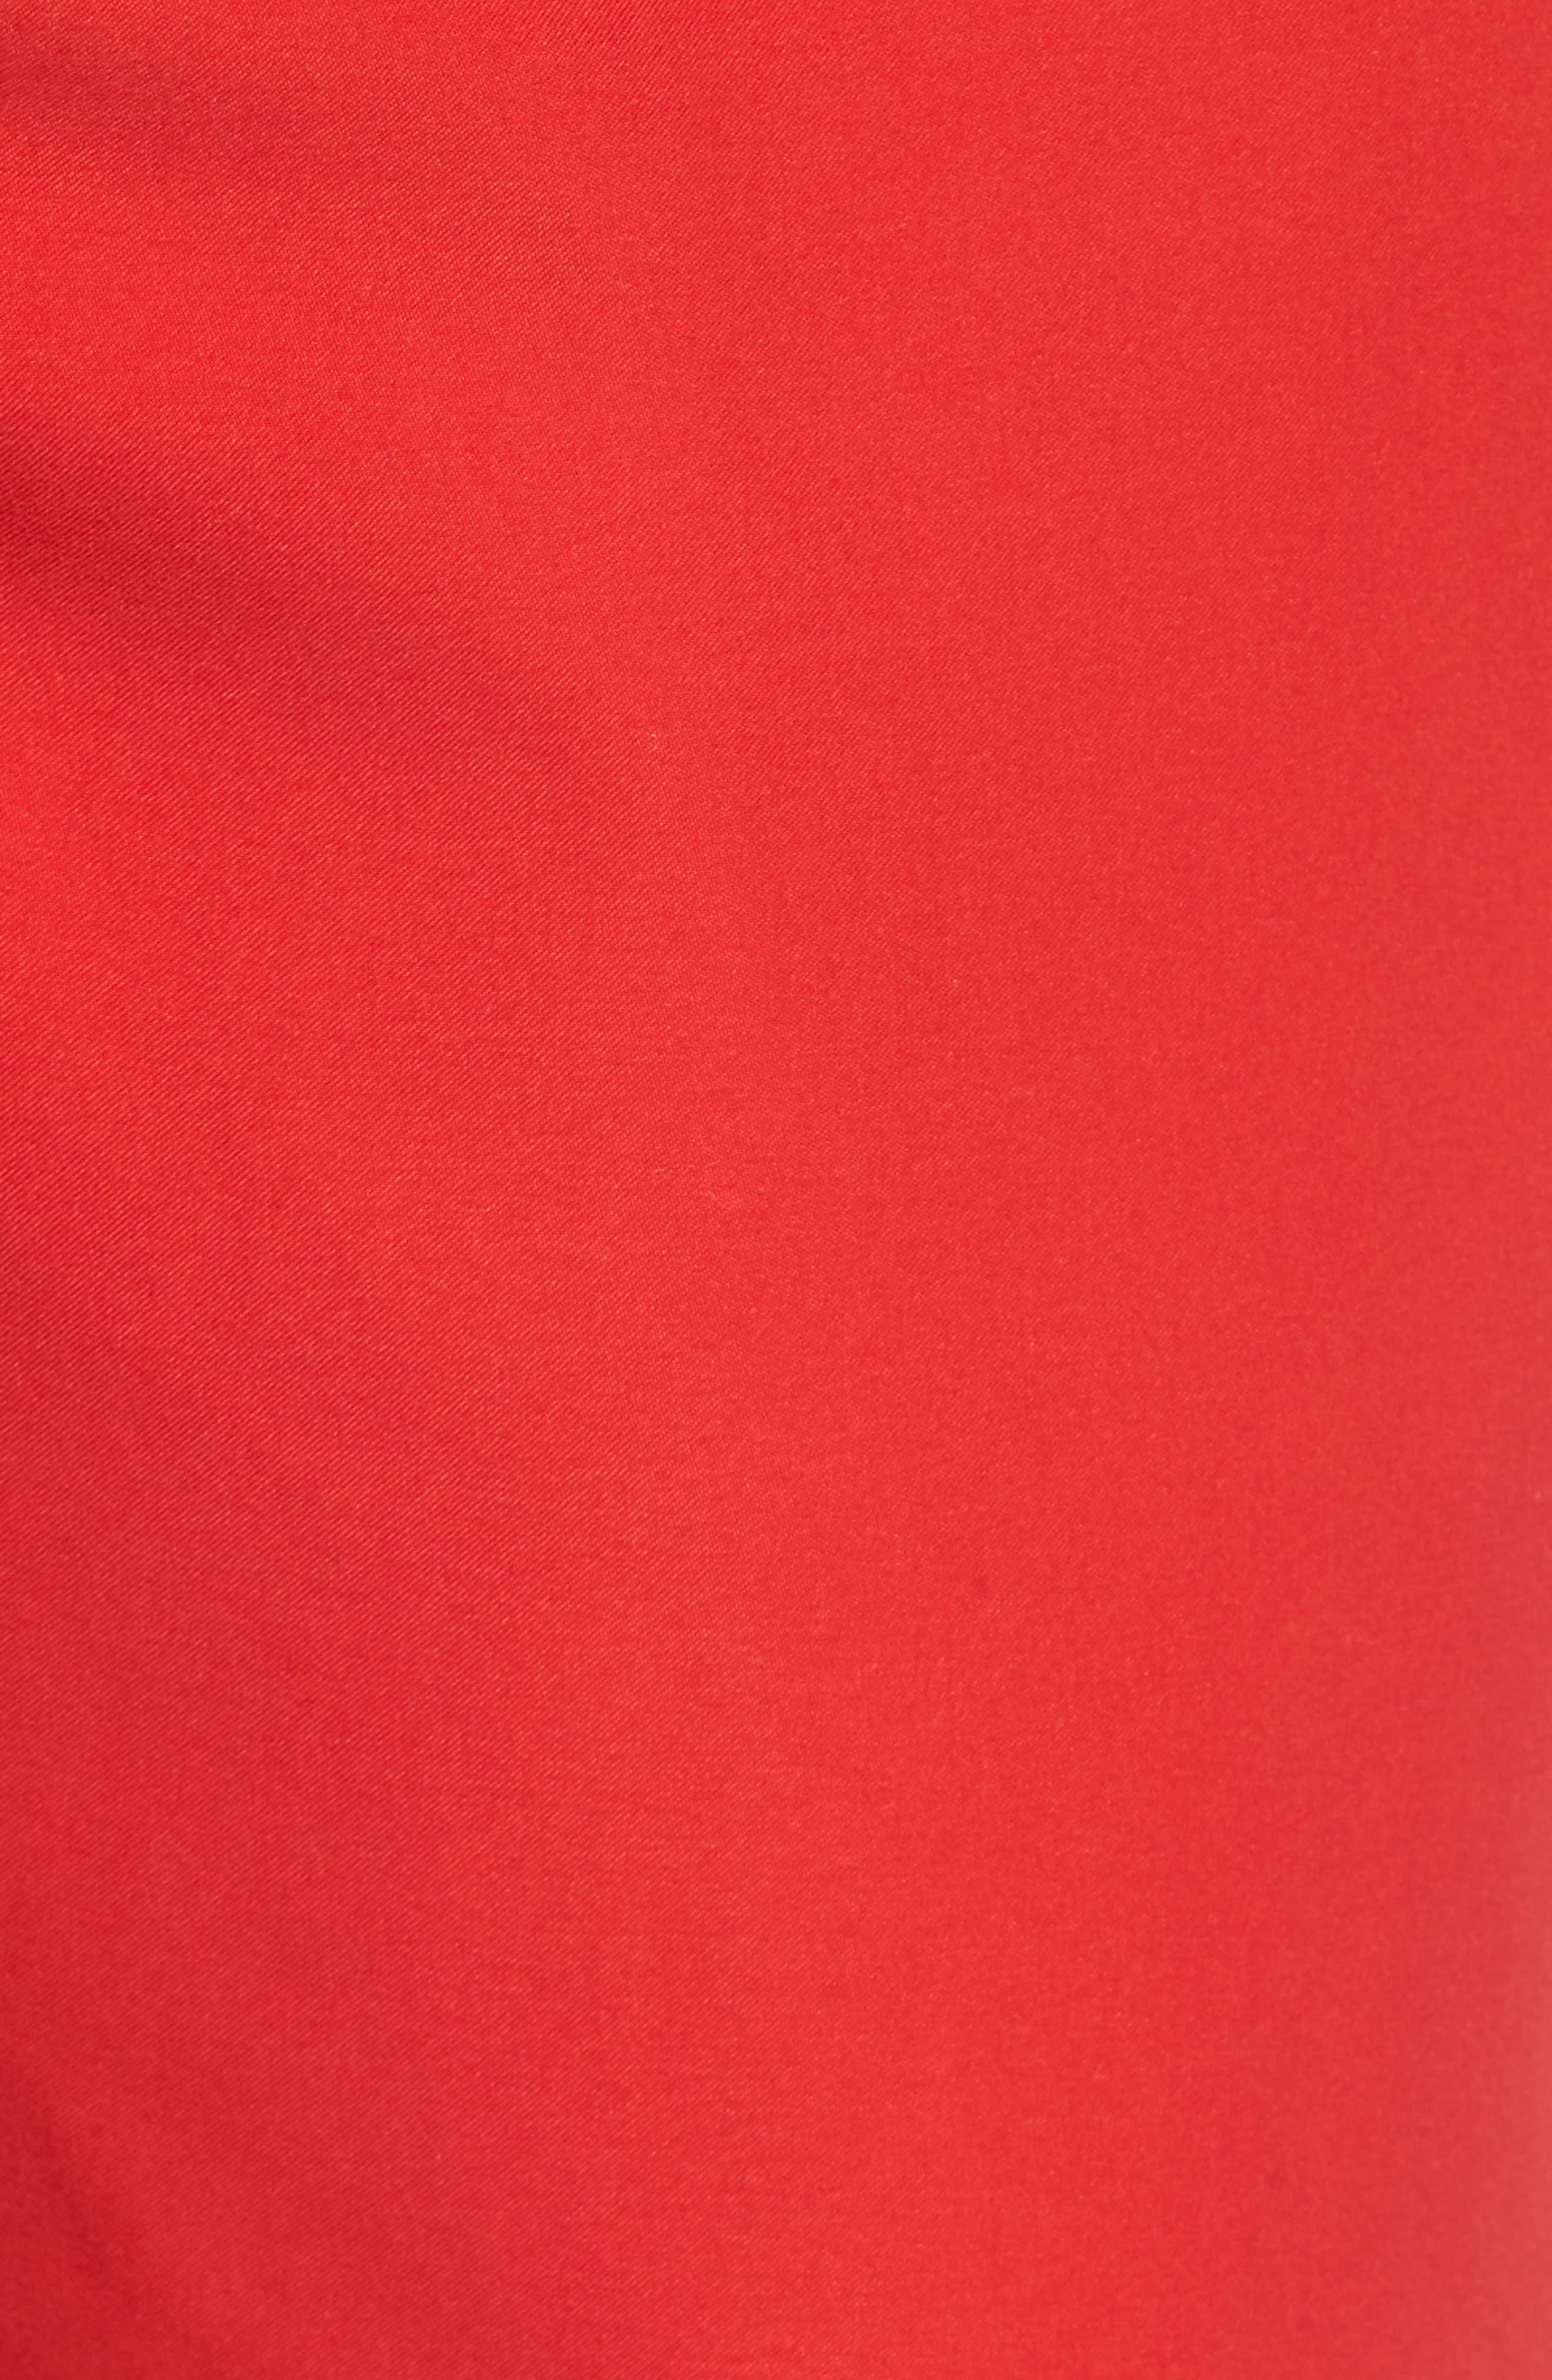 Santa Cruz Board Shorts,                             Alternate thumbnail 5, color,                             Red